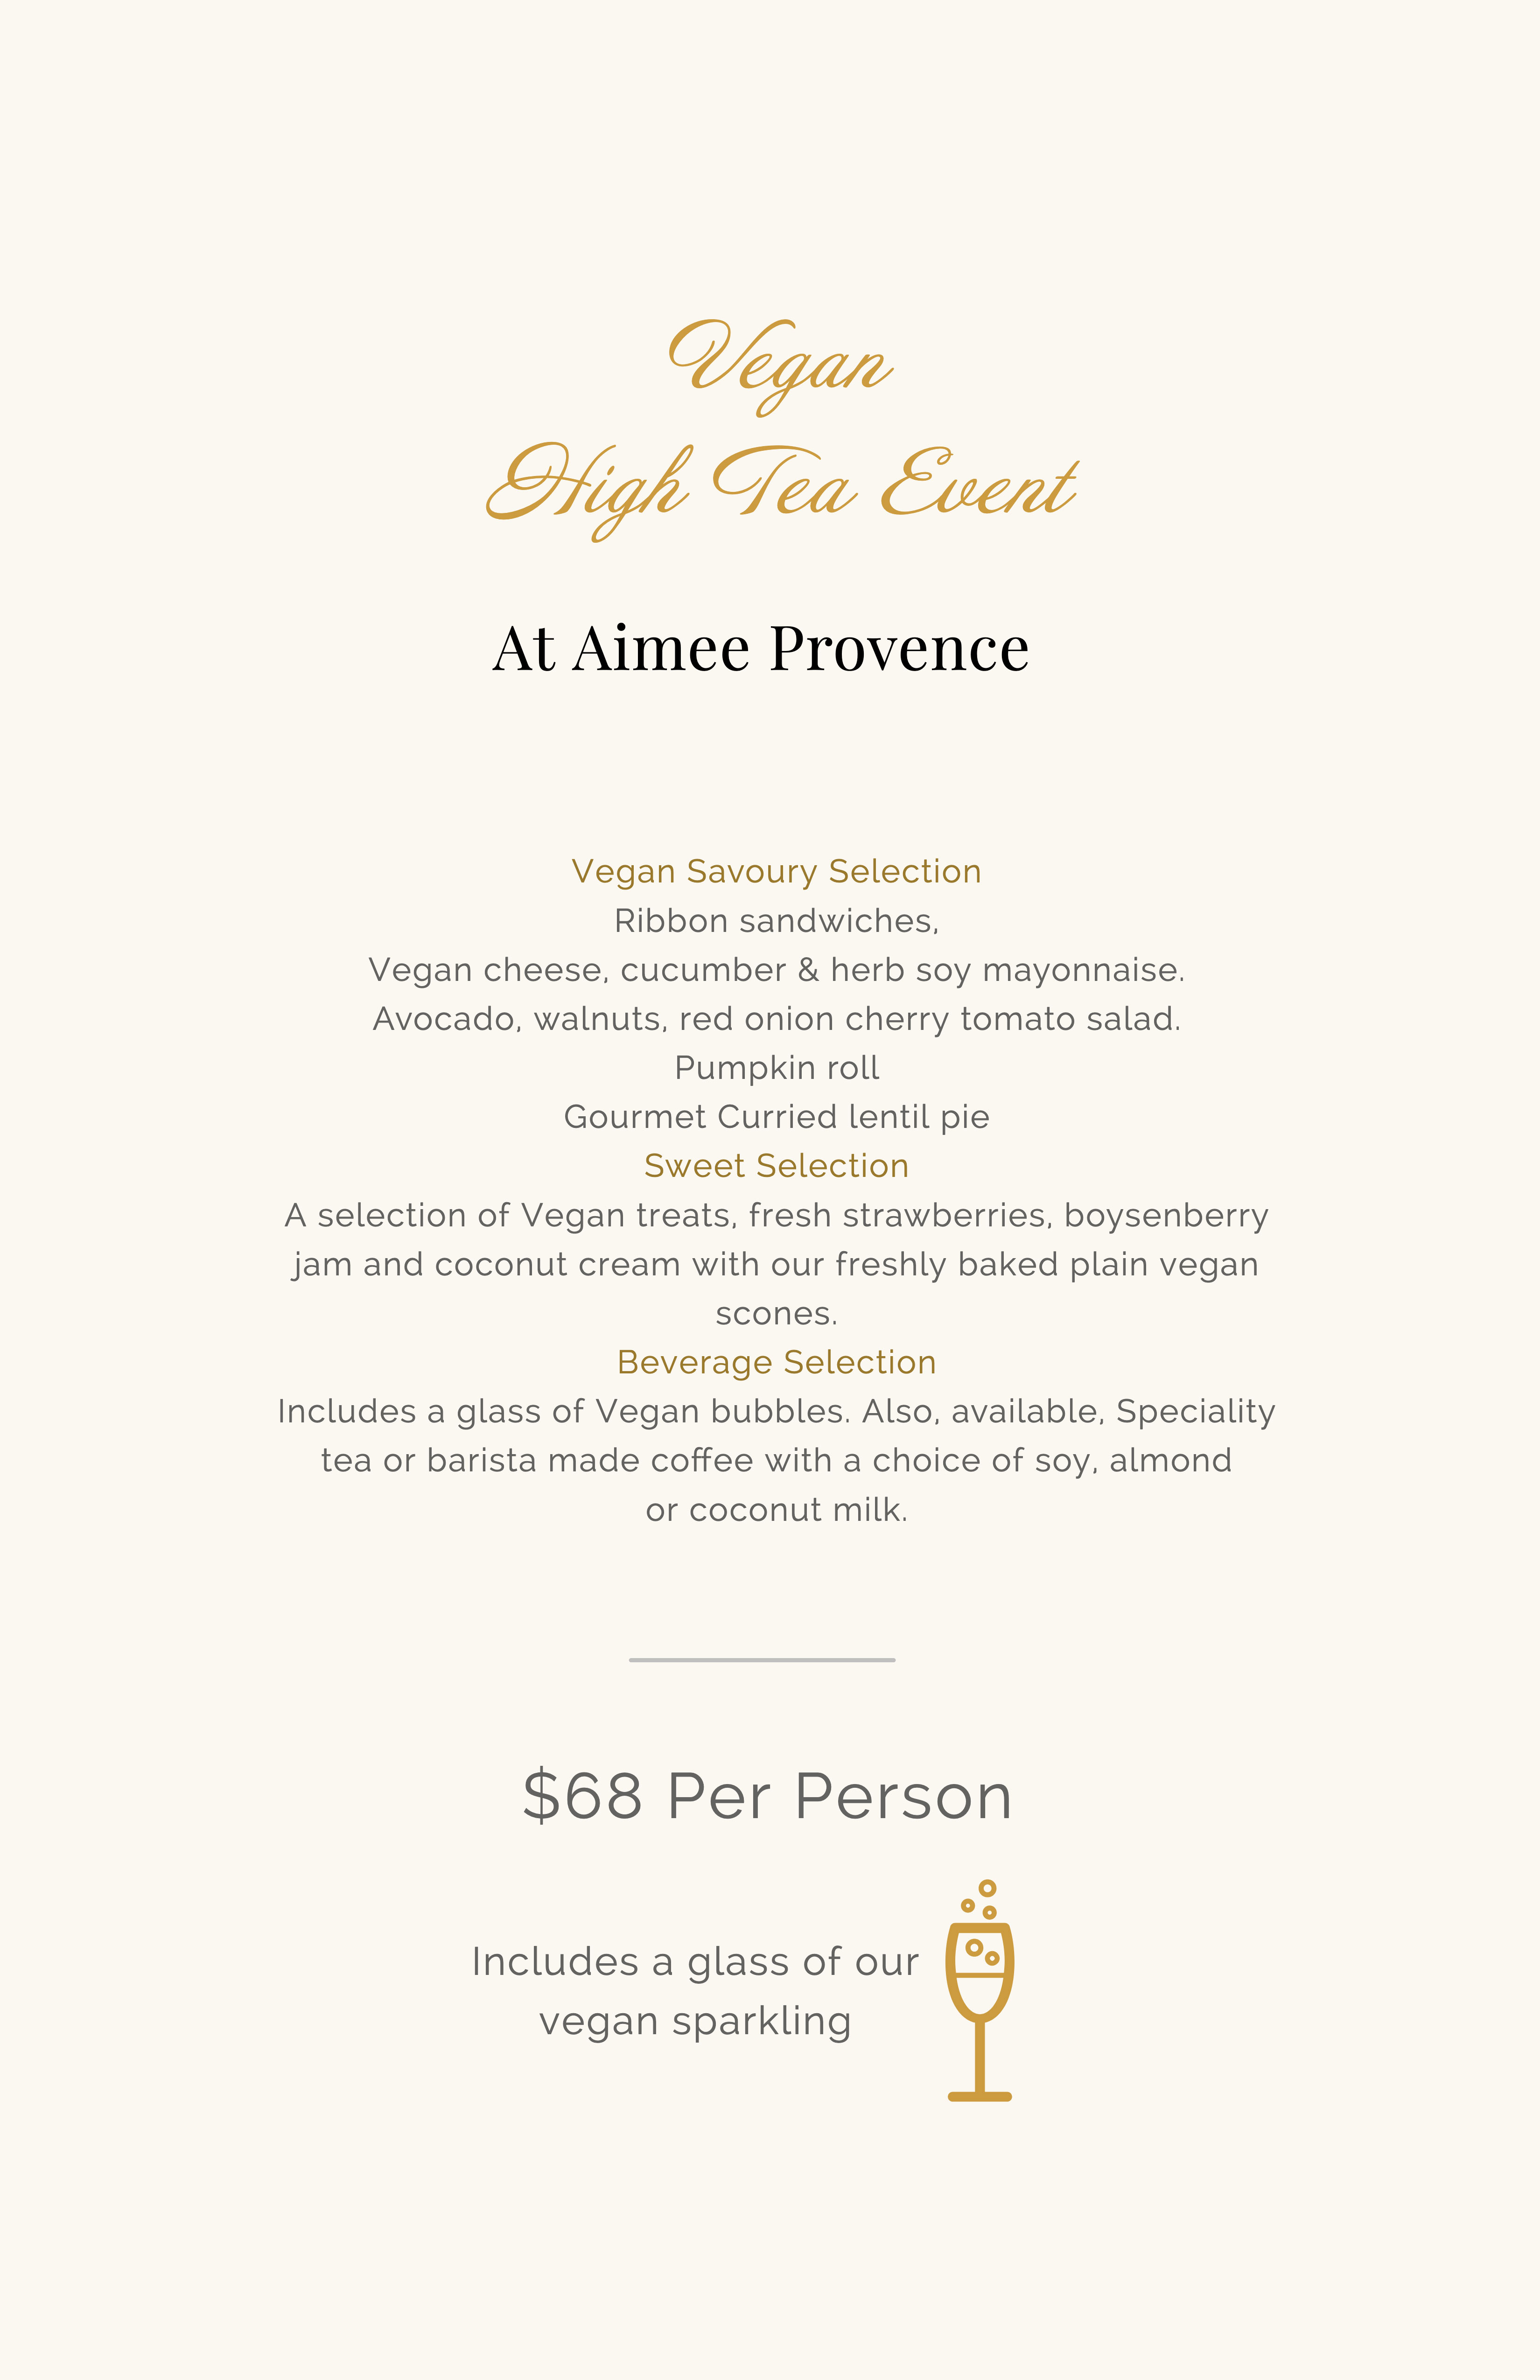 vegan high tea menu